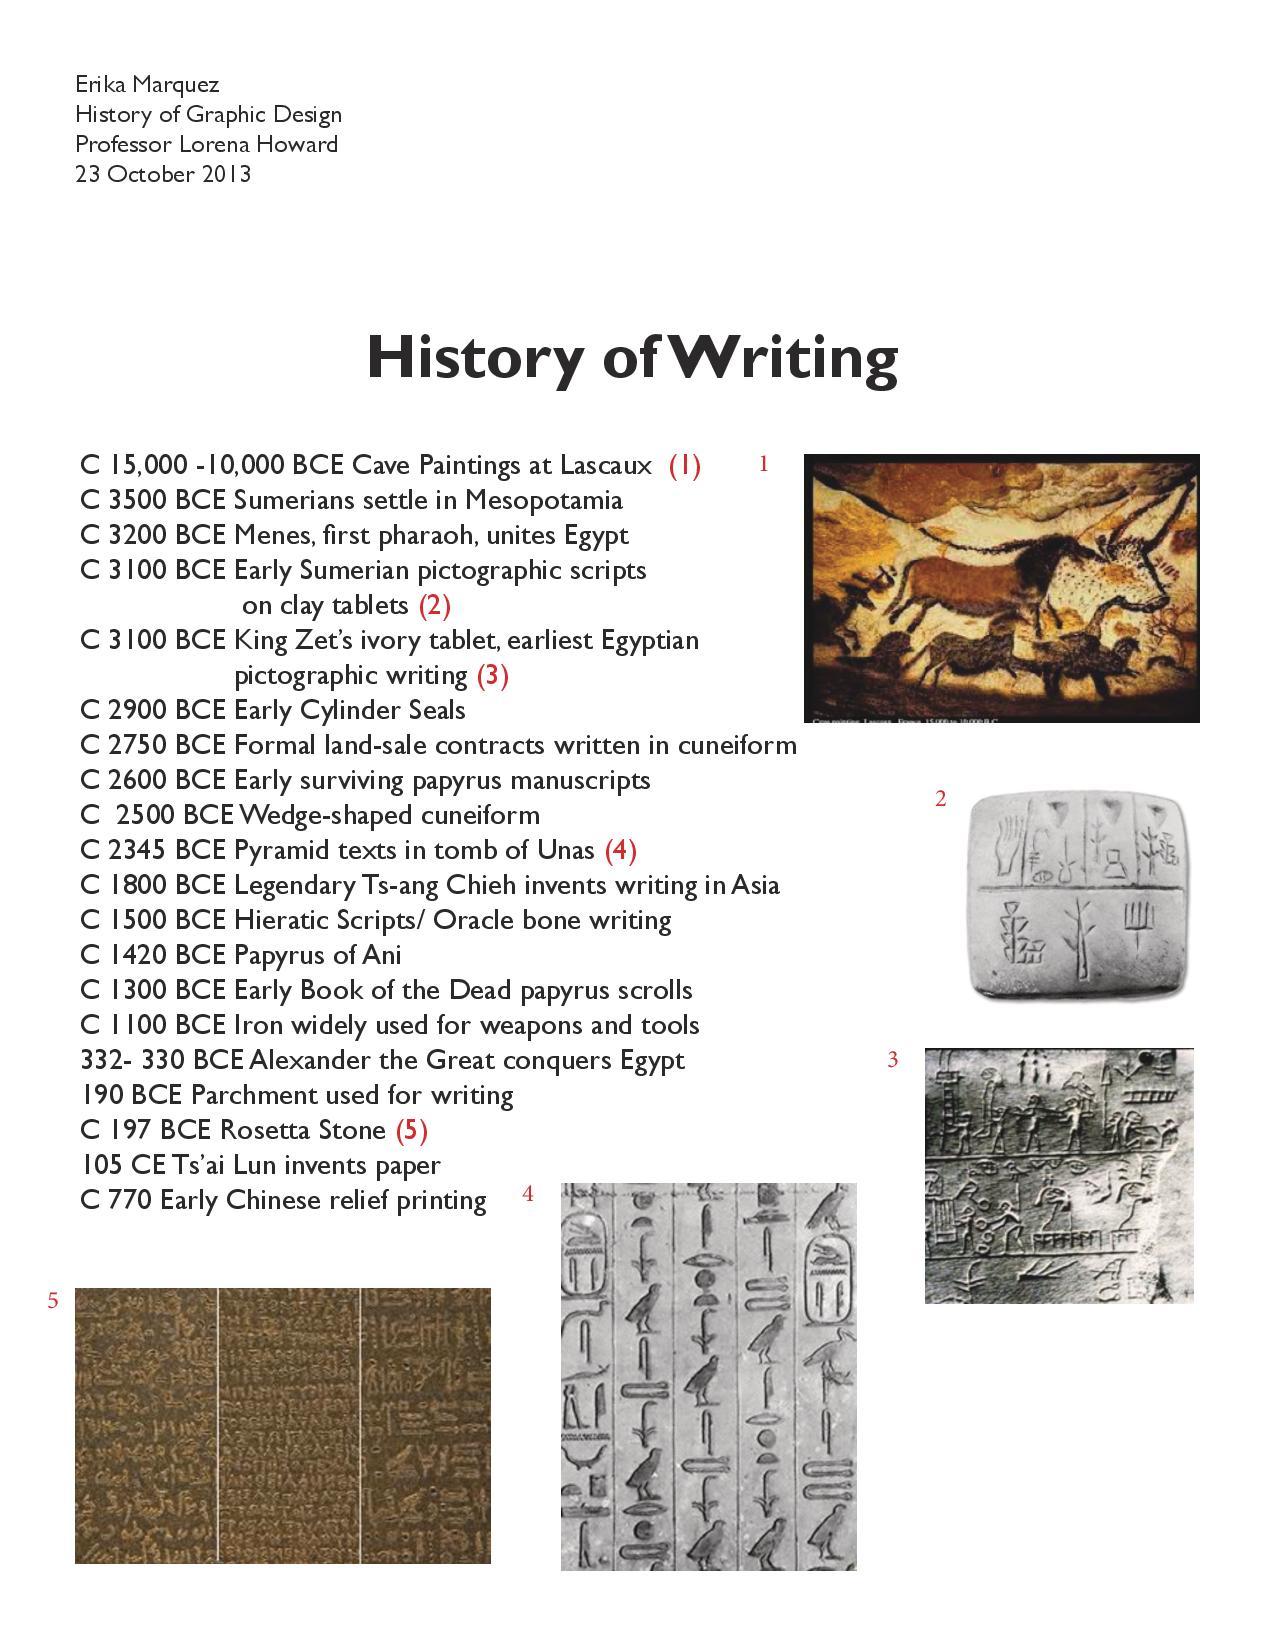 Gdes History Writing Timeline